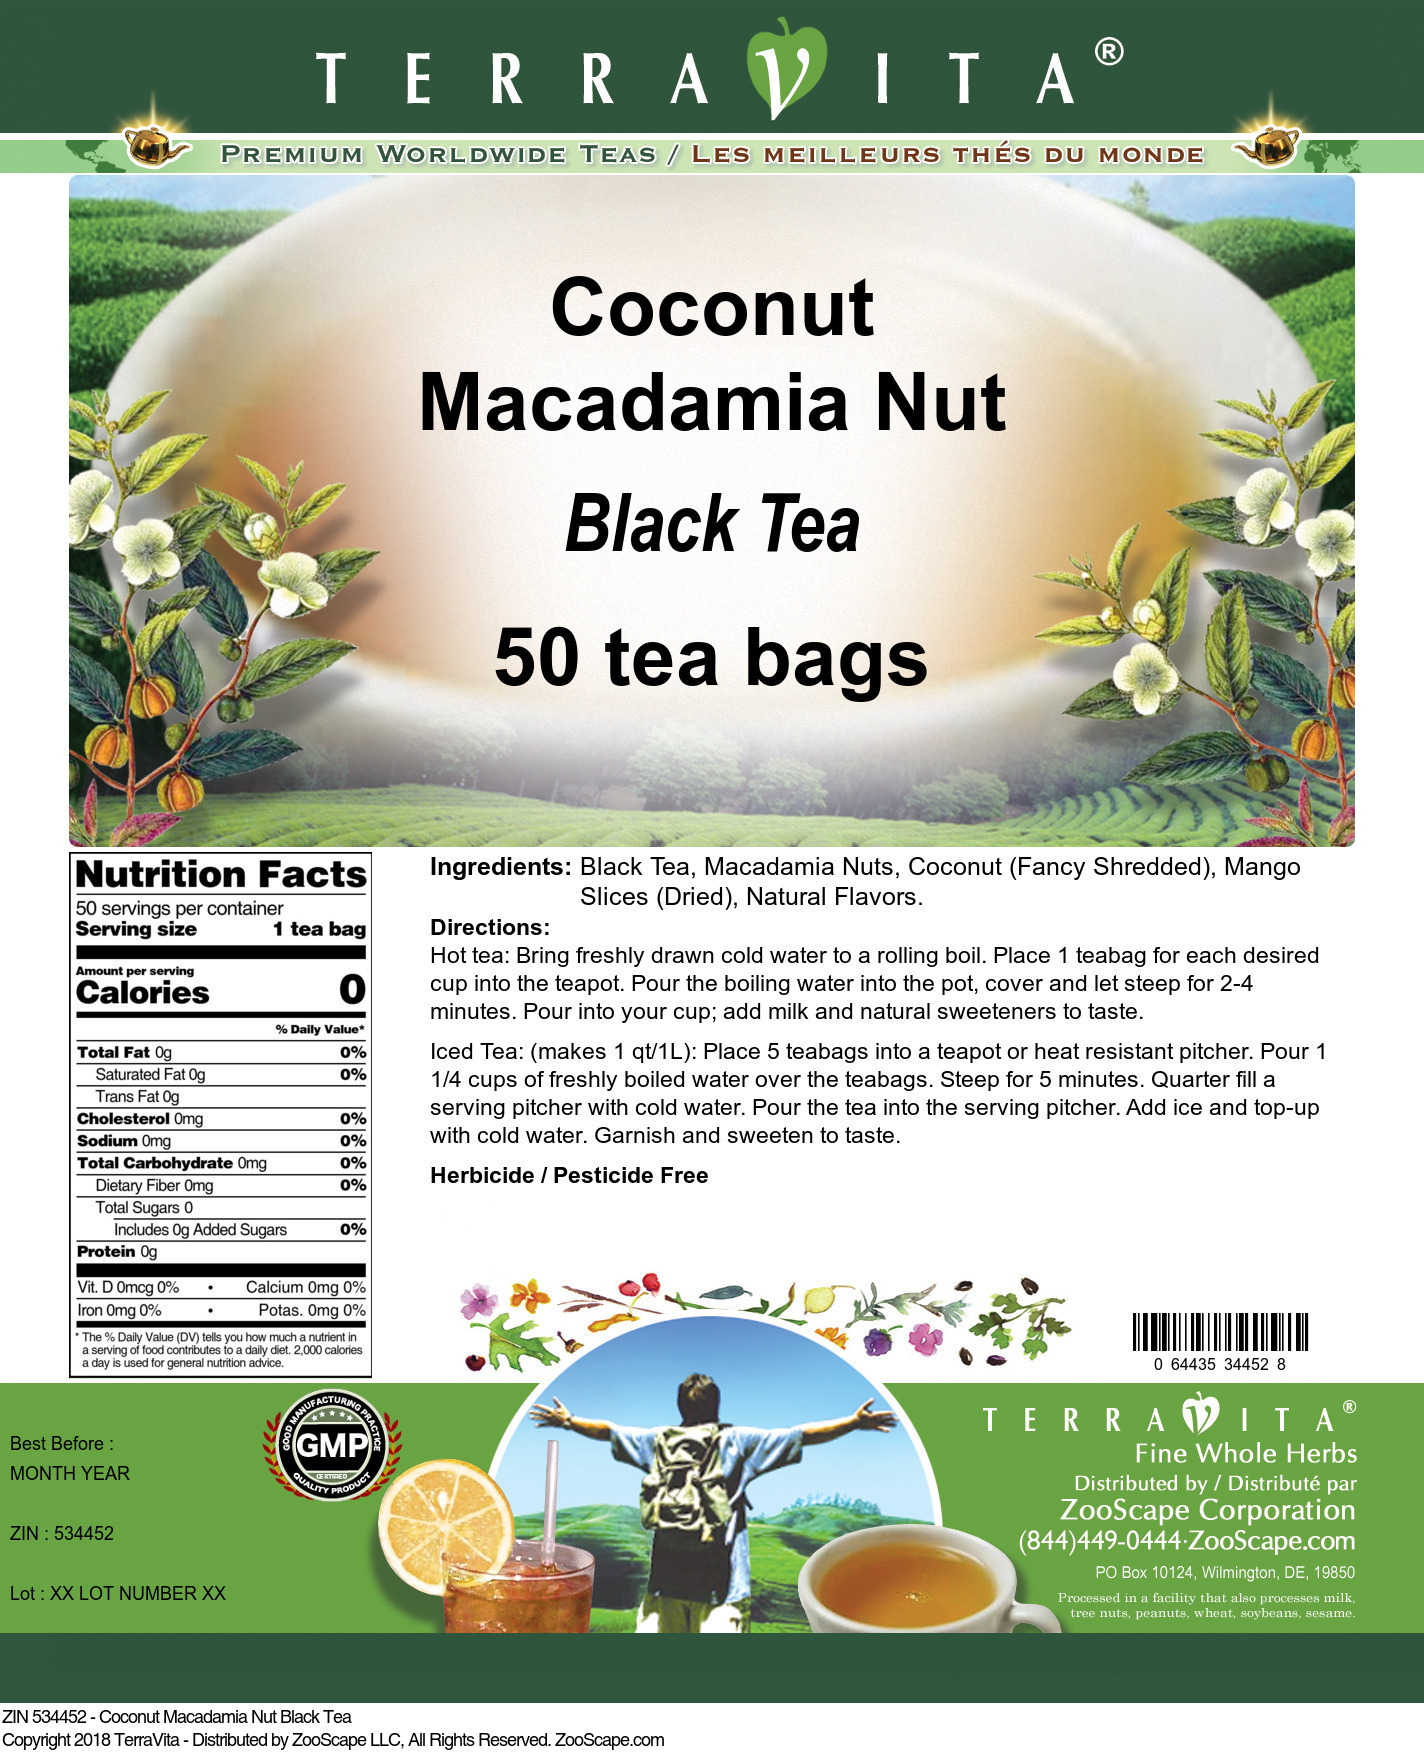 Coconut Macadamia Nut Black Tea